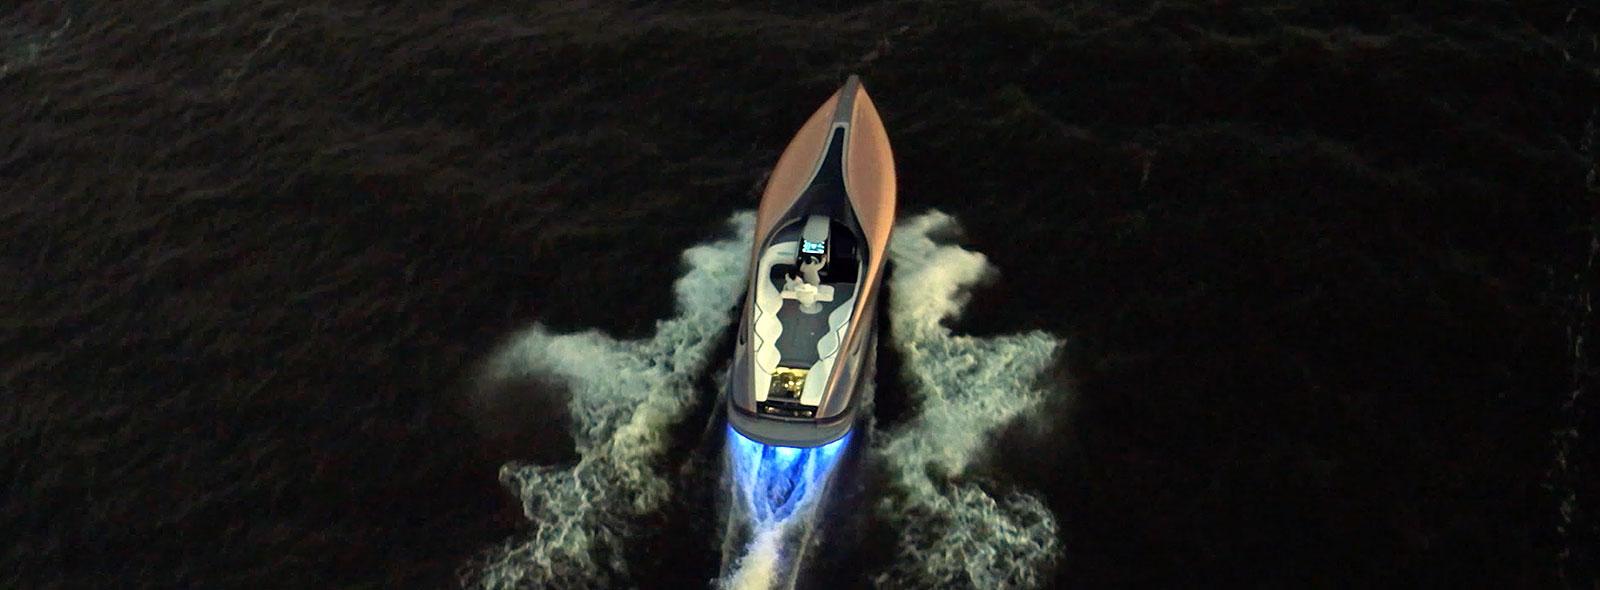 2017 Lexus Sports Yacht Concept Gallery Video 01